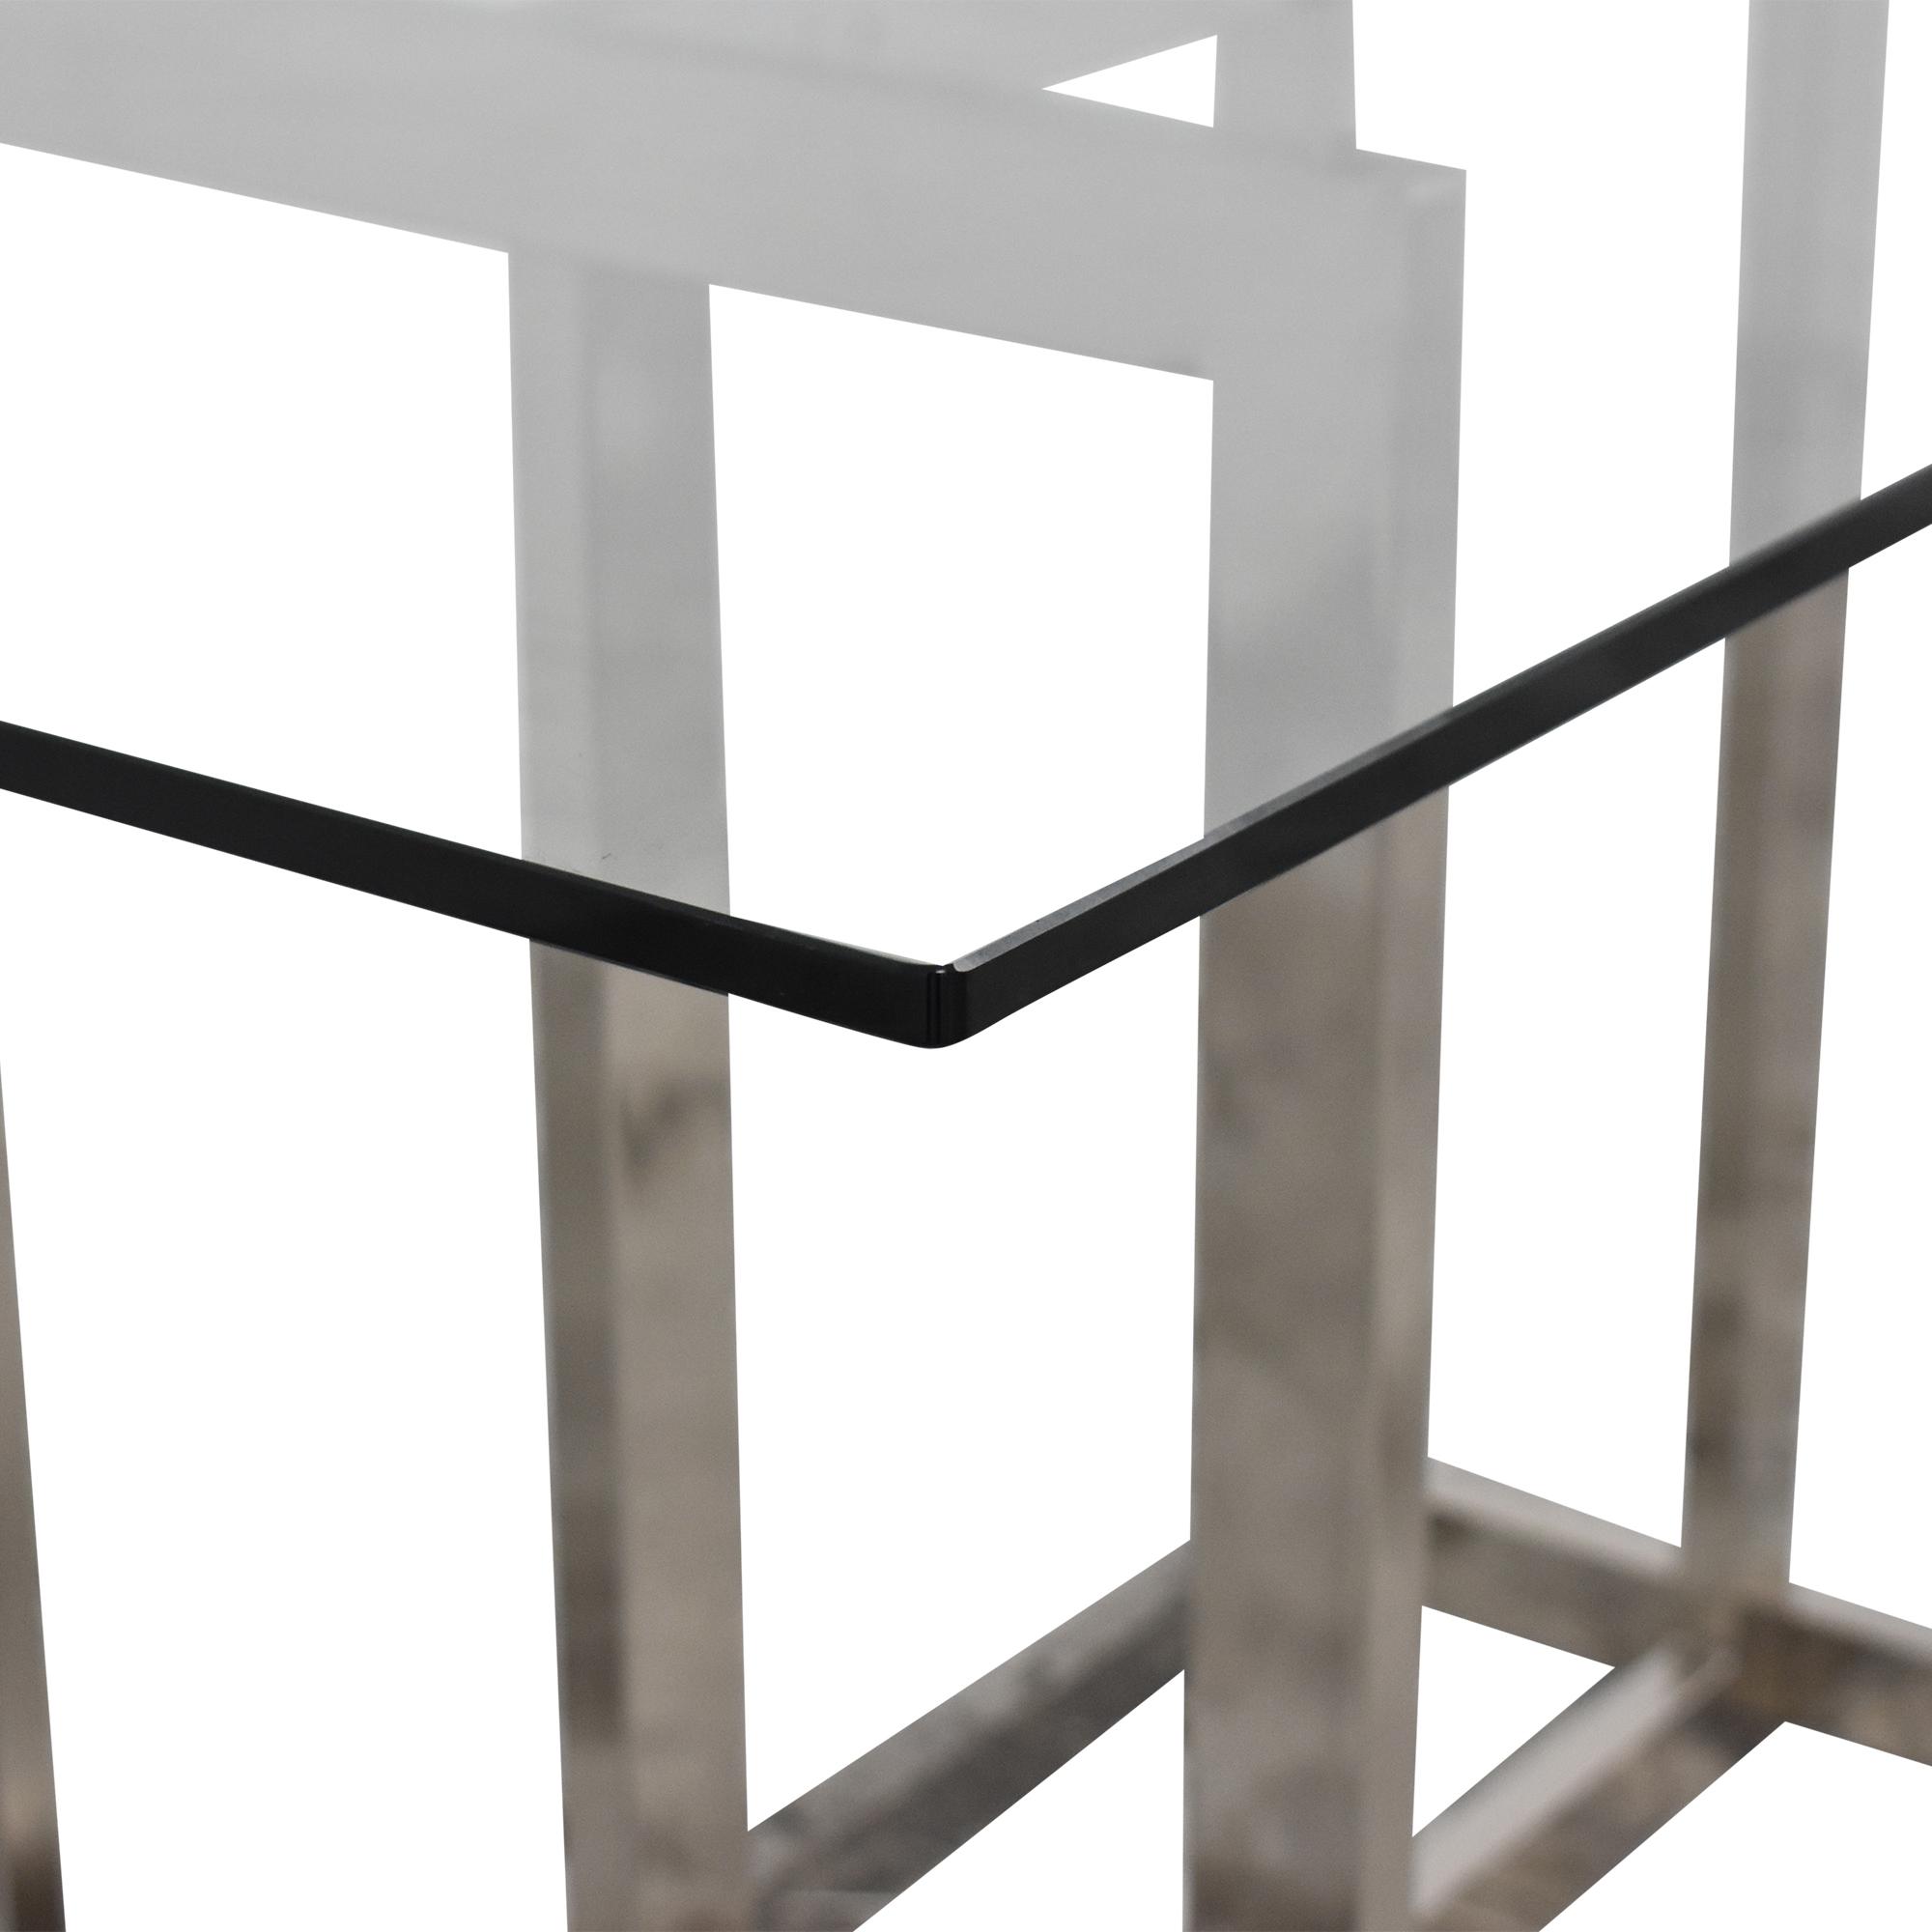 West Elm West Elm Rectangular Glass and Chrome Dining Table nj